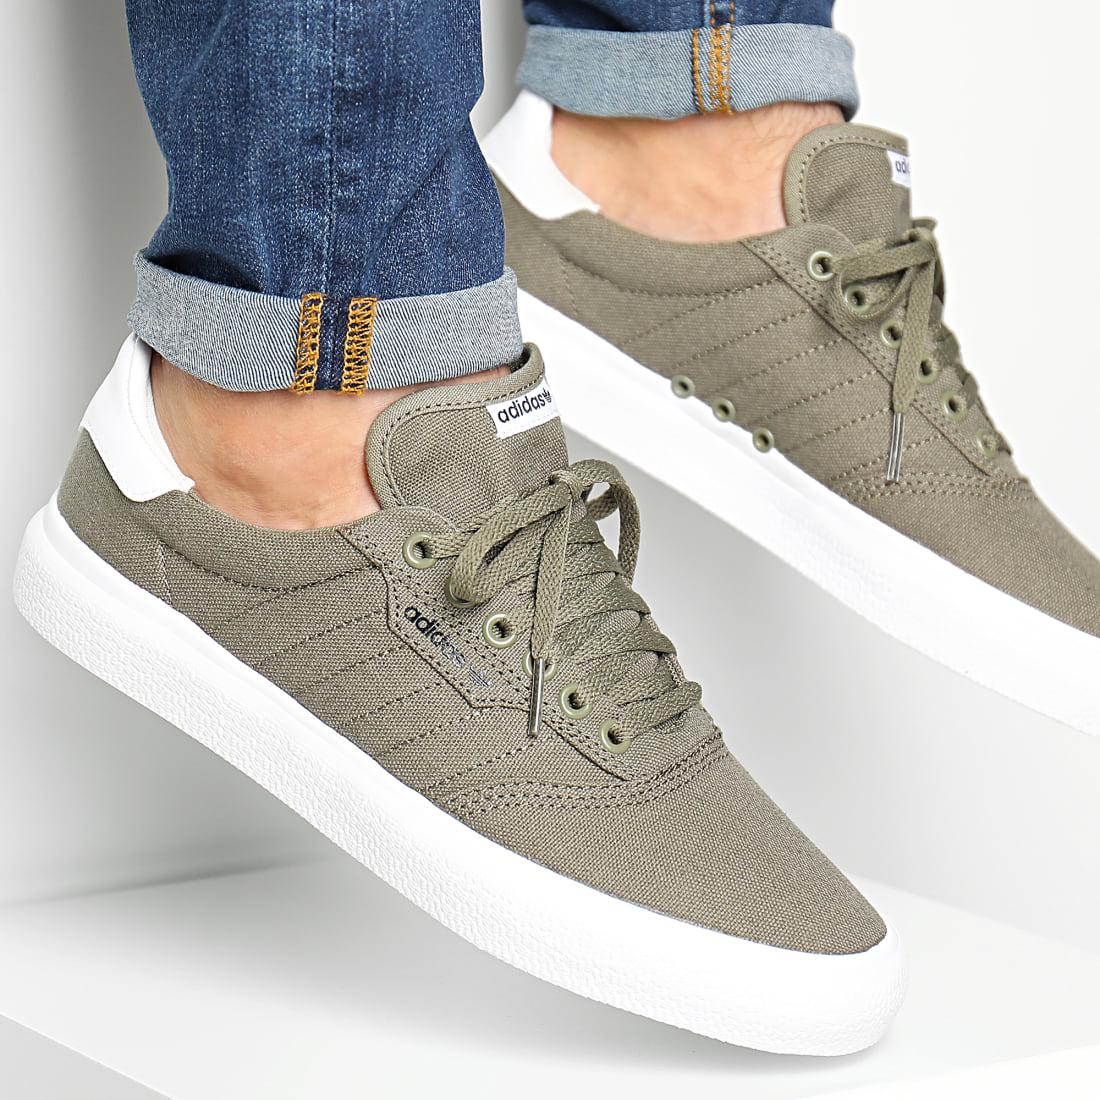 adidas Baskets 3MC Vulc DB3141 Raw Khaki Footwear White